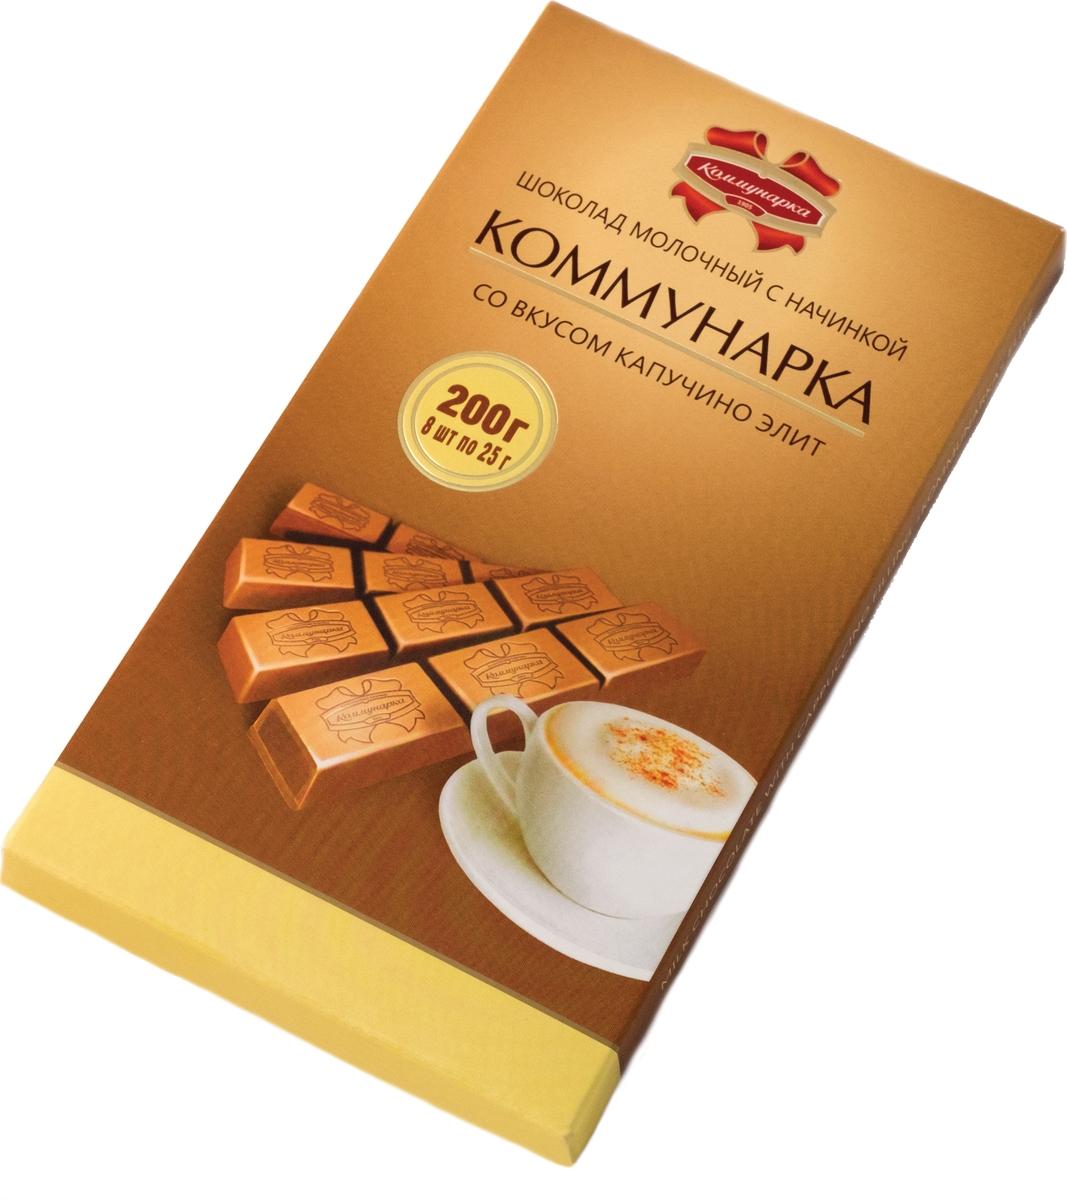 Коммунарка шоколад молочный со вкусом капучино элит, 200 г цена 2017